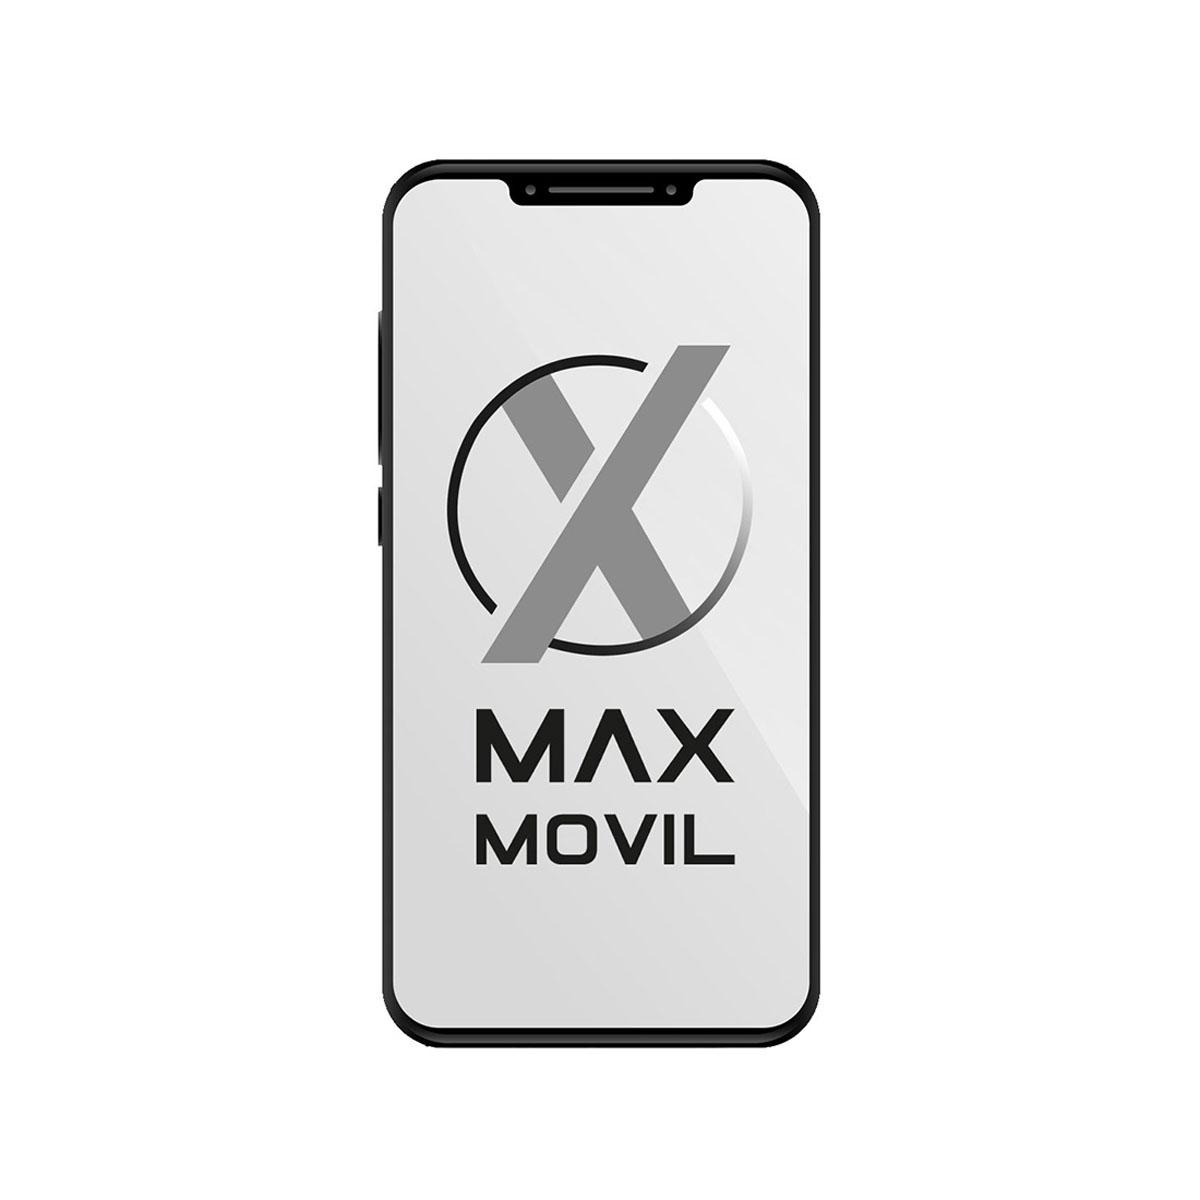 Comprar Sony Xperia M5 online